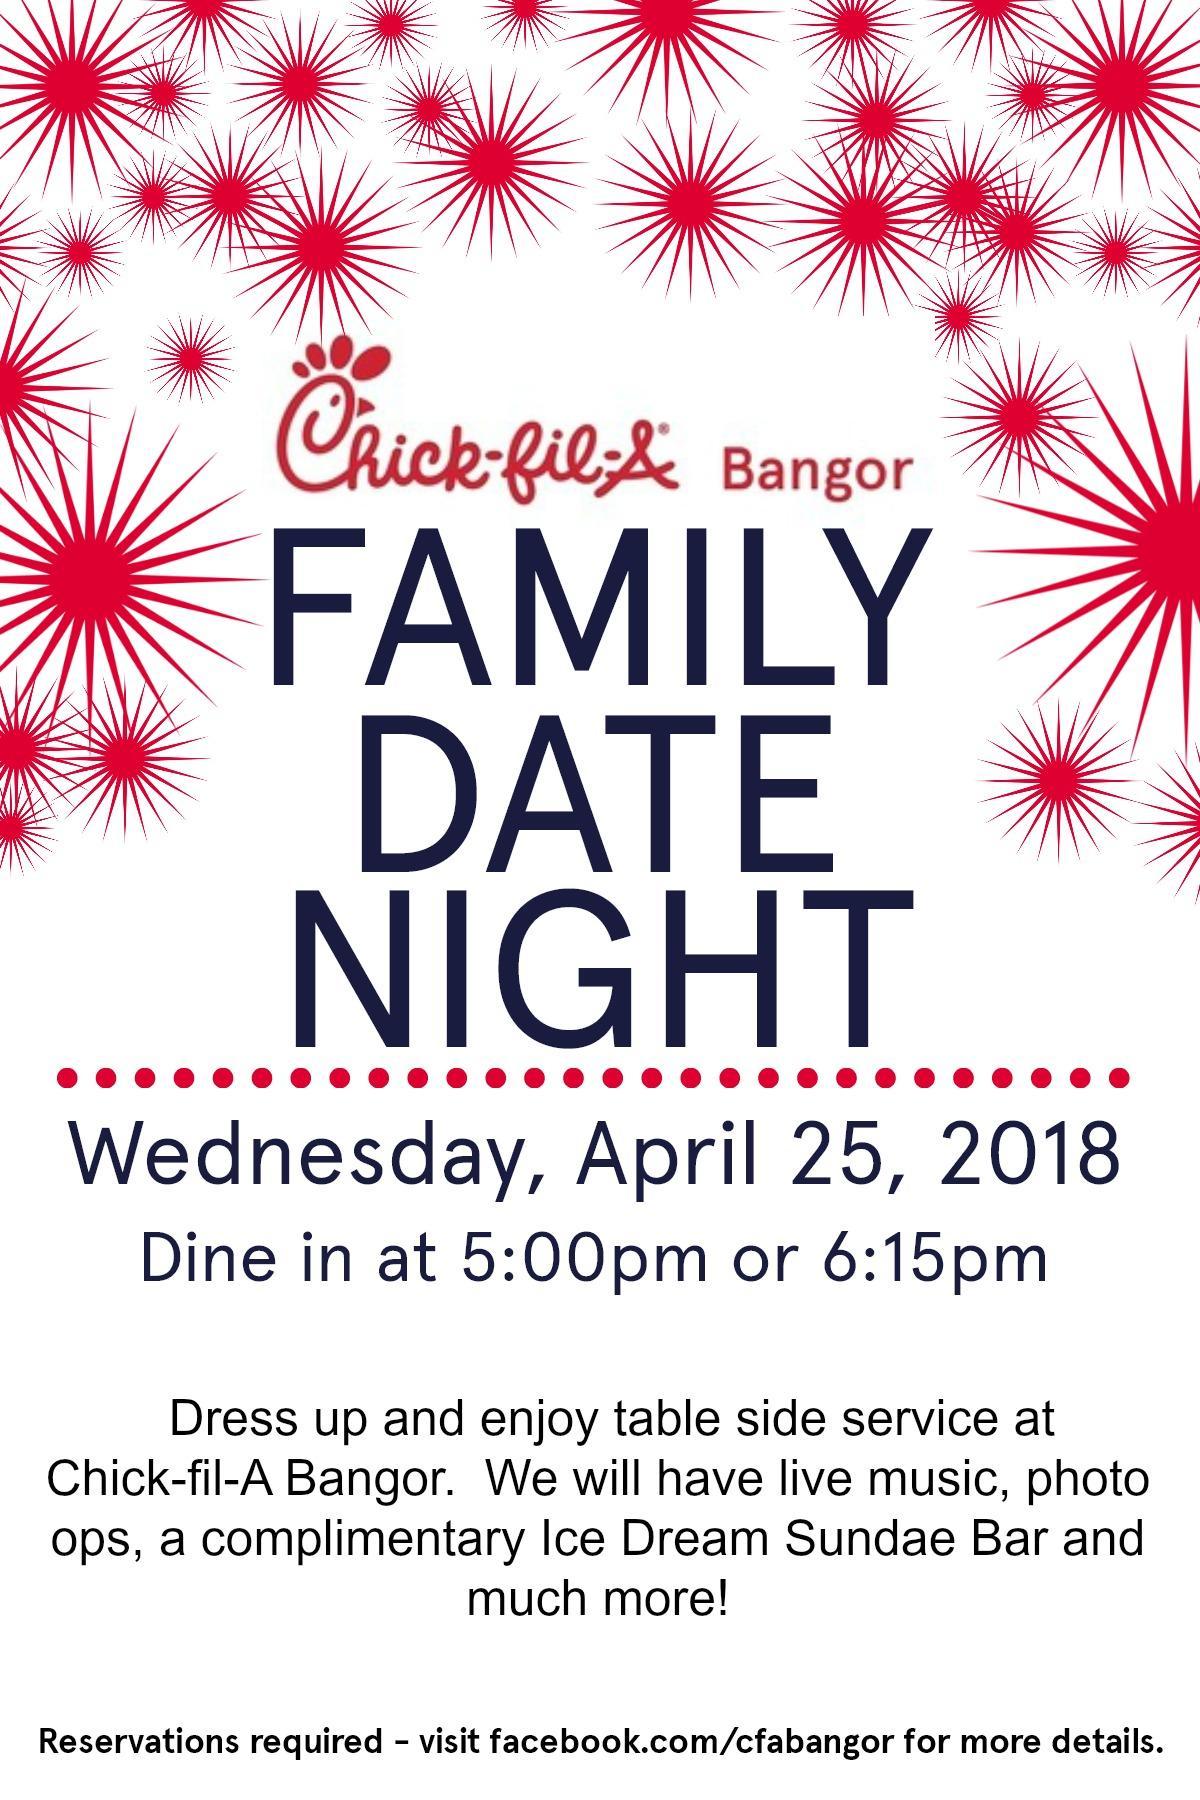 Family Date Night - 25 APR 2018